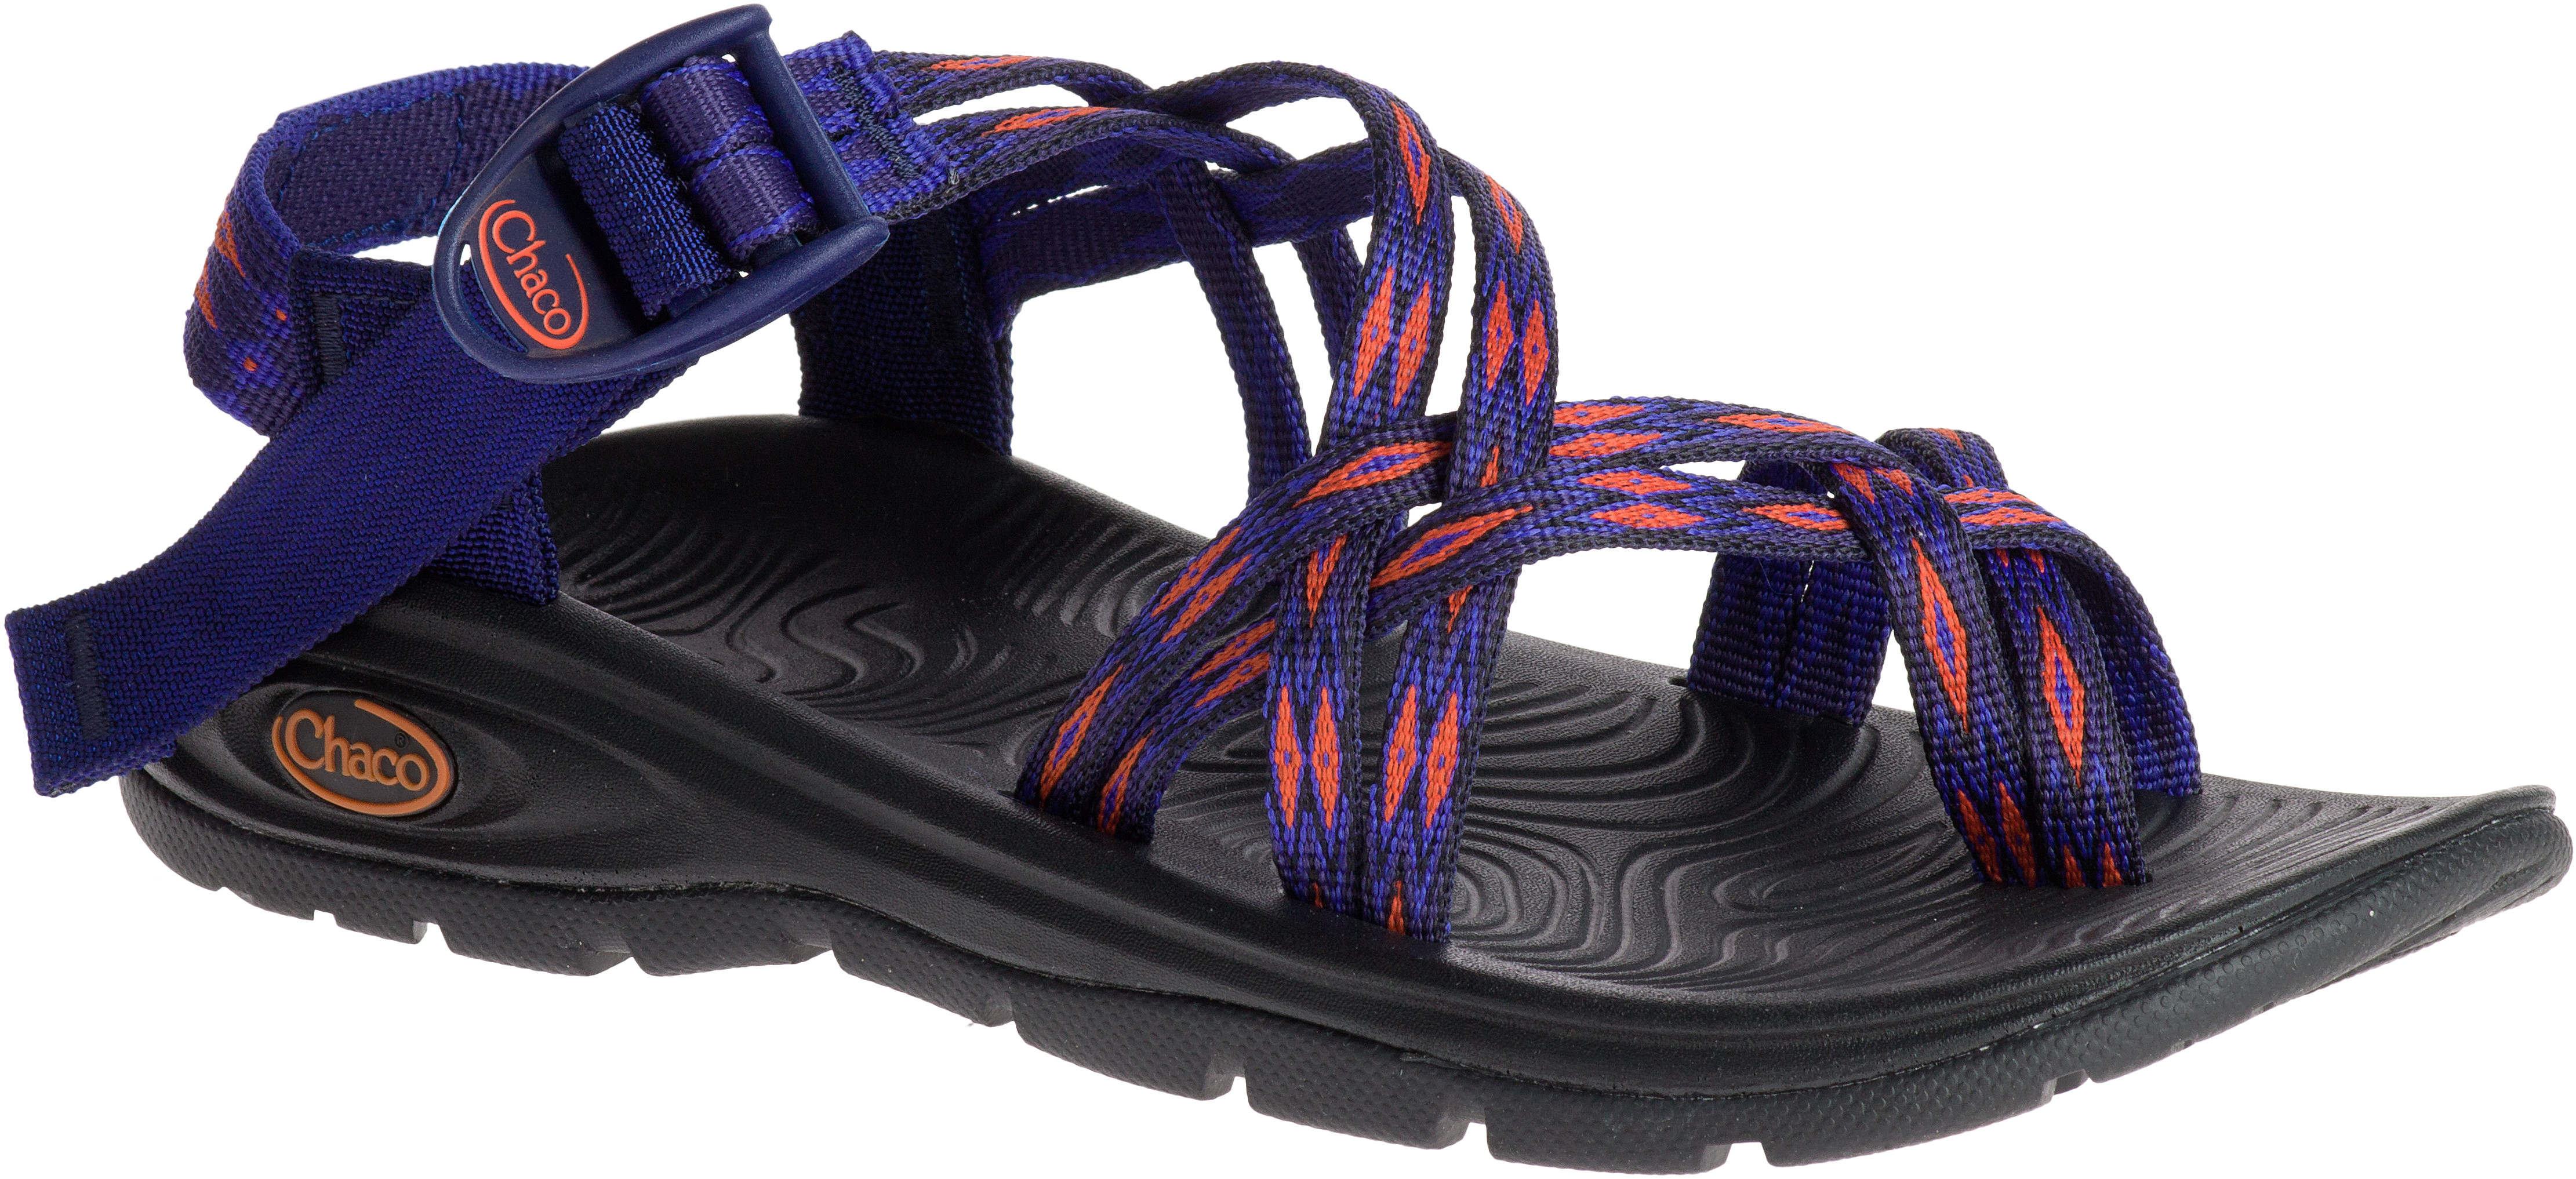 0fe0daa30 Chaco ZVolv X2 Sandal - Womens